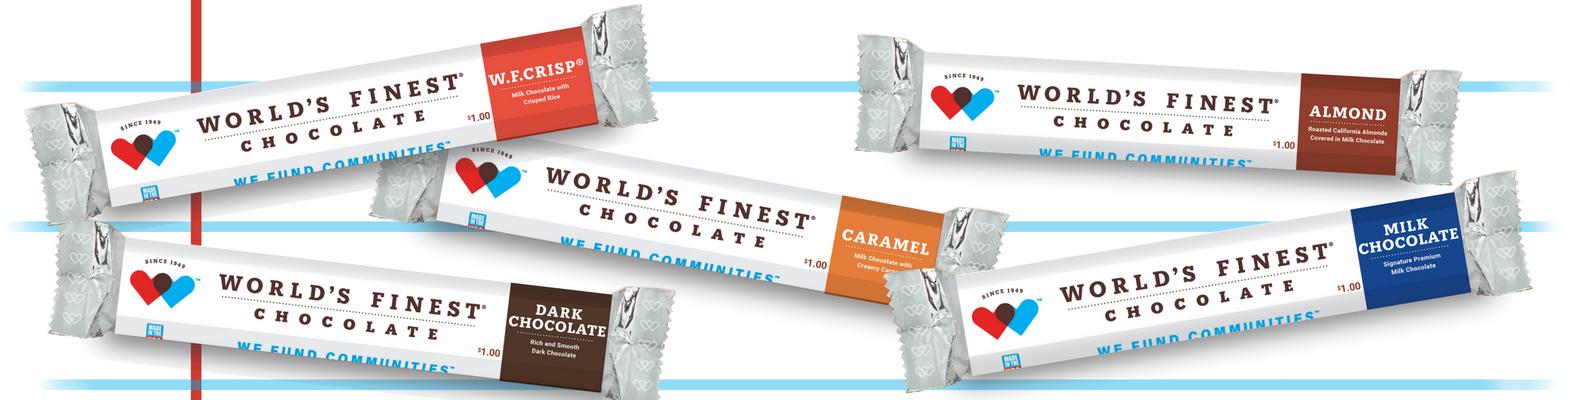 World's Finest Chocolate Fundraising.